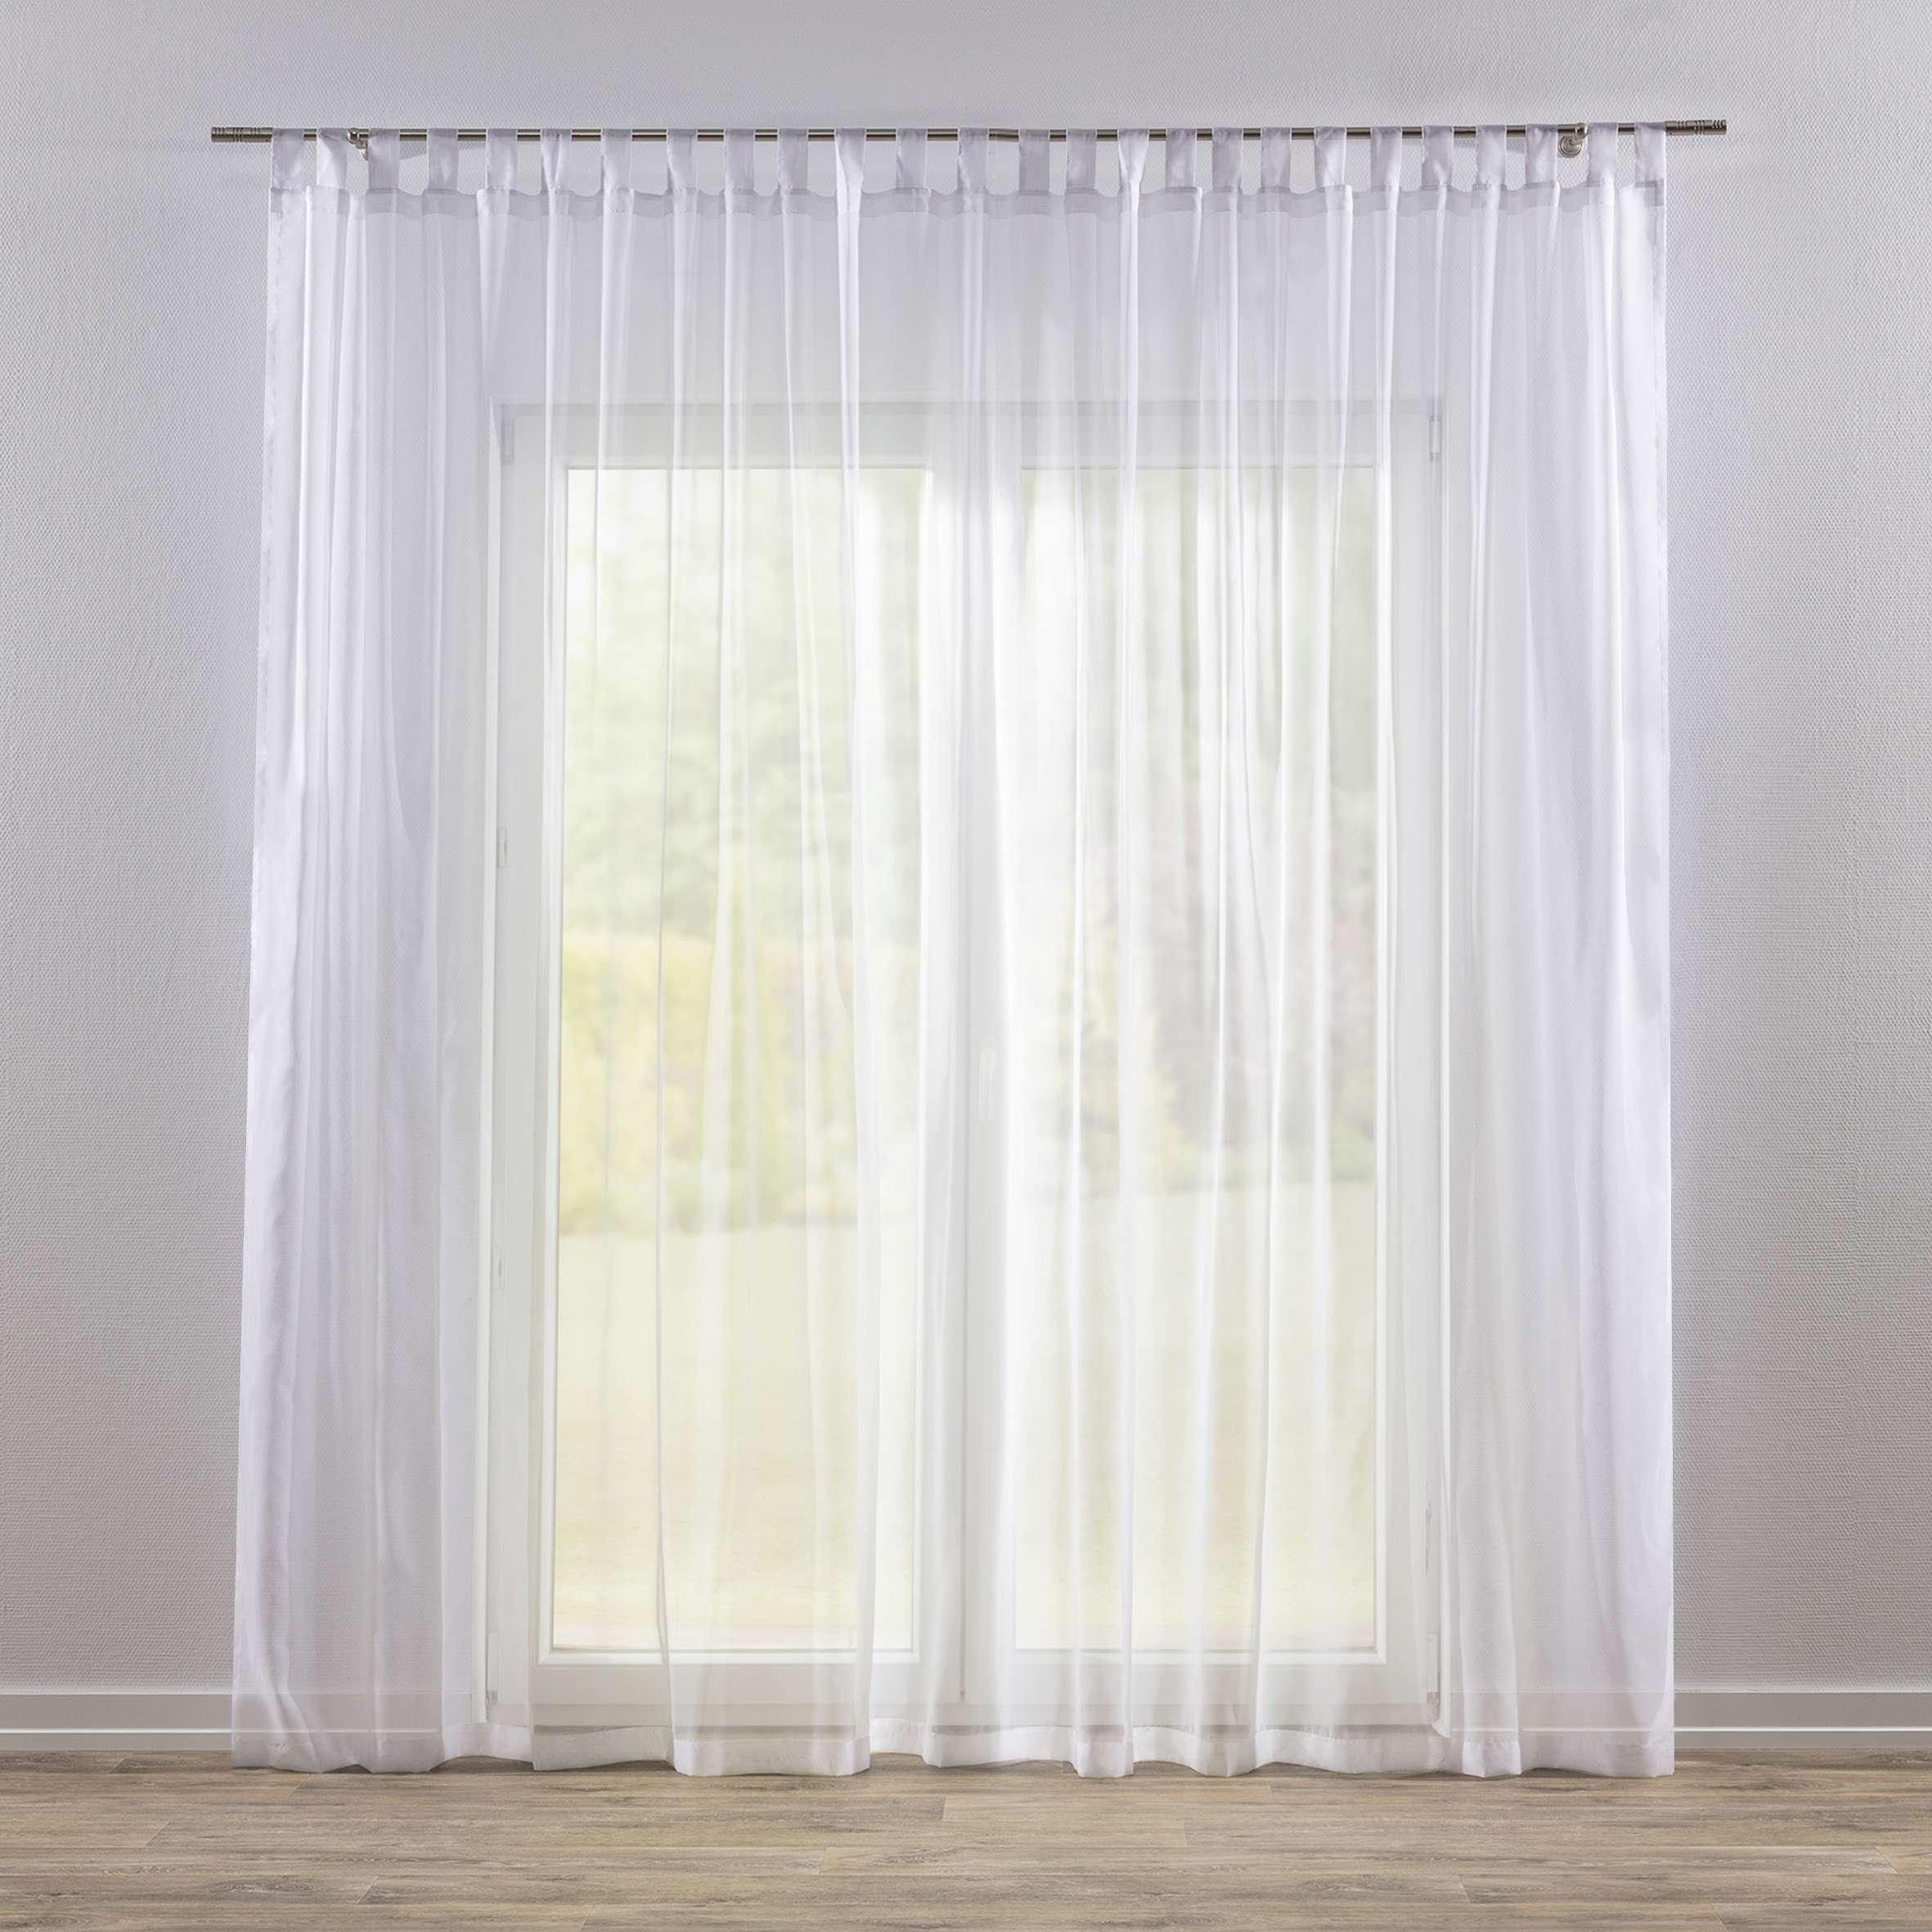 Záclona z voálu na pútkach V kolekcii Voálové záclony, tkanina: 900-00